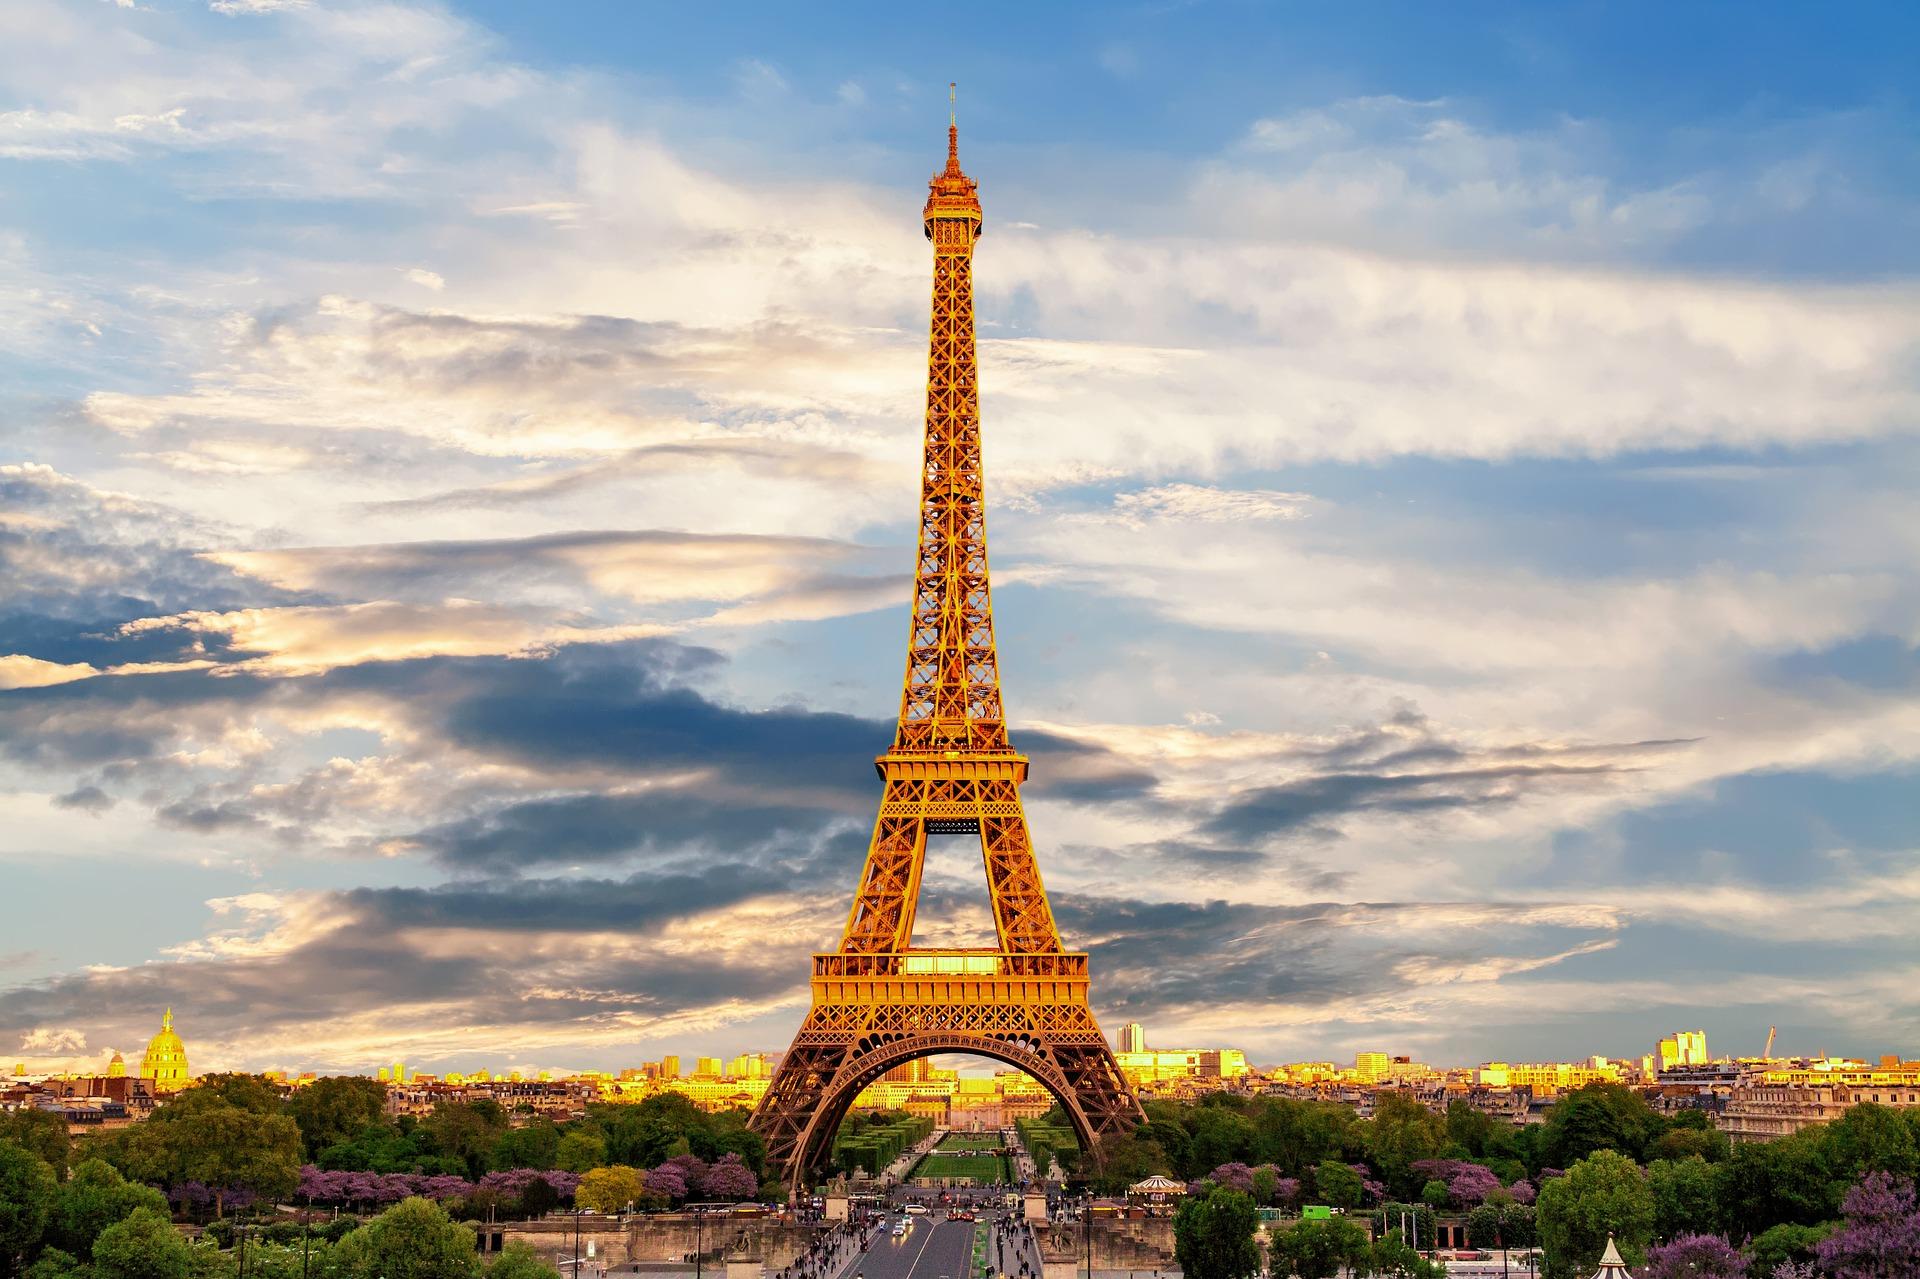 Paris is amazing for visit and make memories